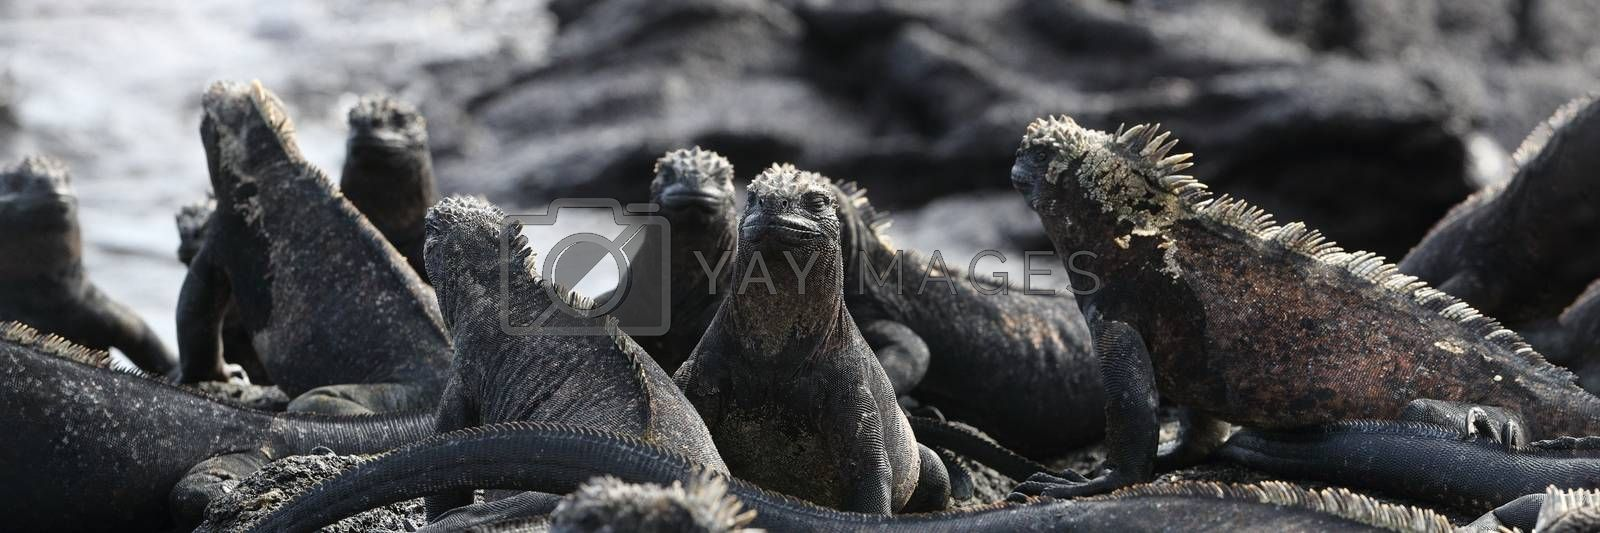 Animals. Galapagos Marine Iguana - Iguanas warming in the sun on volcanic rocks on Fernandina Island, Espinoza Point. Amazing wildlife animals on Galapagos Islands, Ecuador.